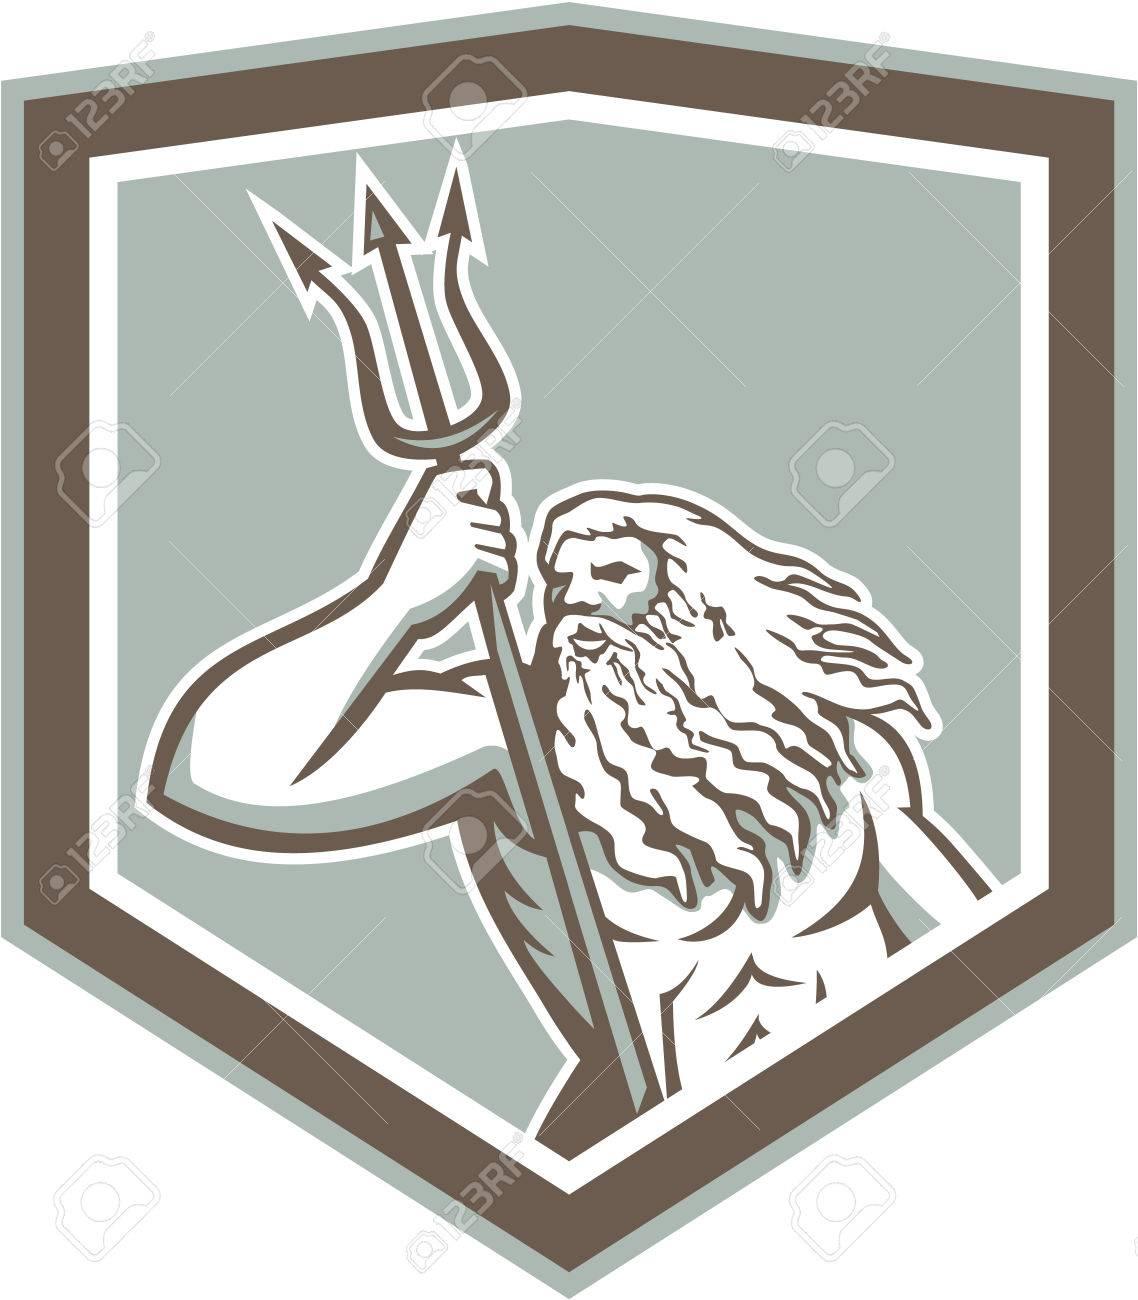 Illustration of Roman god of sea Neptune or Poseidon of Greek mythology holding a trident set inside shield crest on isolated white background. Stock Vector - 27669772